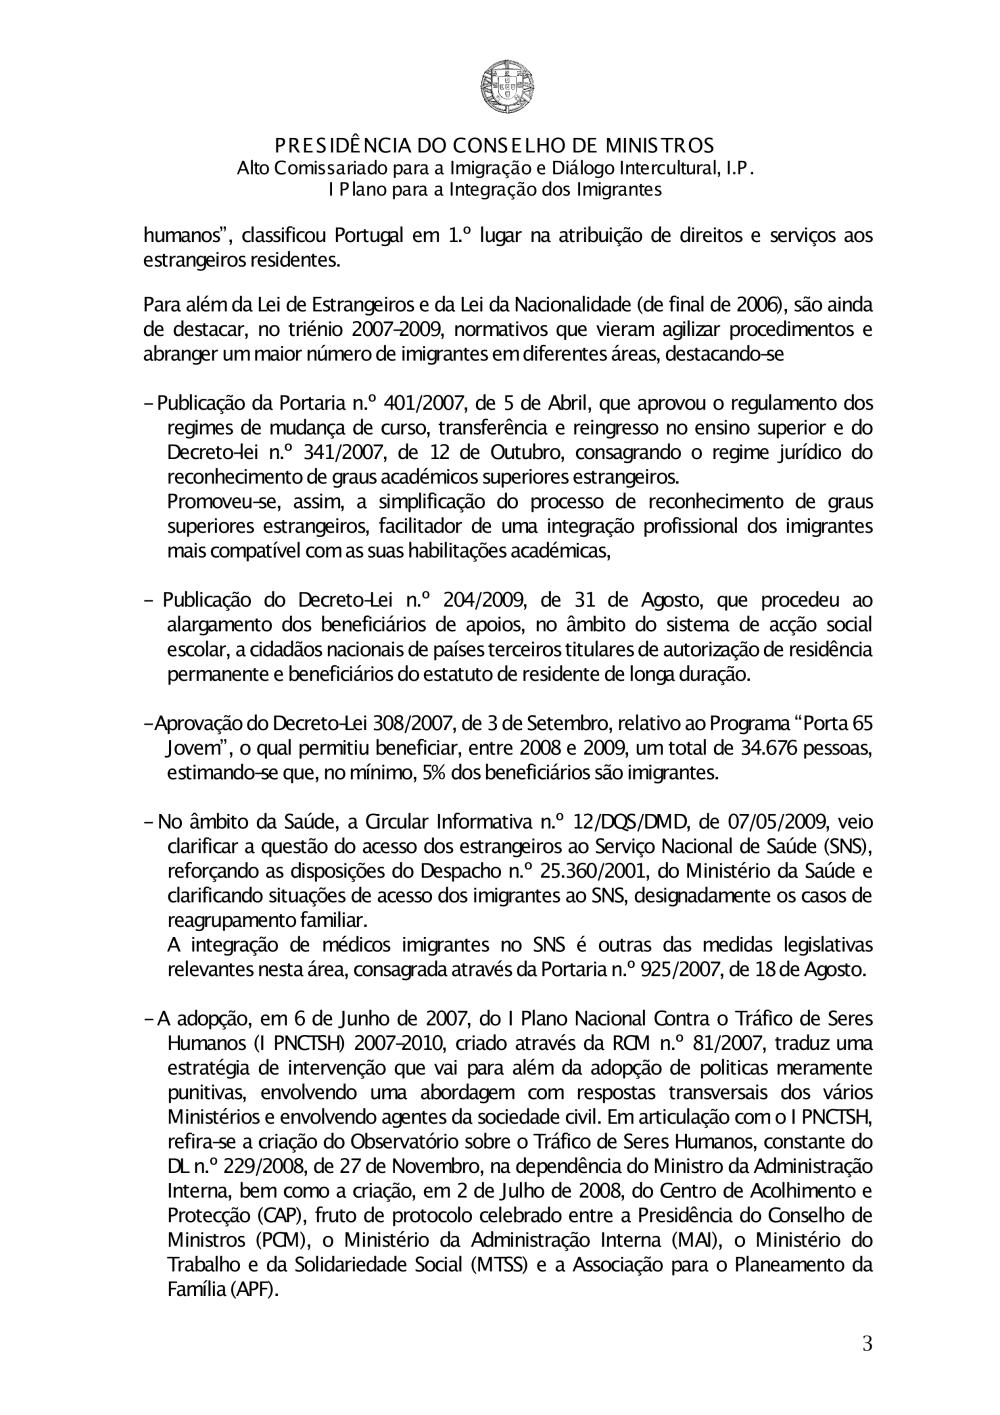 RelatorioFinaldoPII 2007 2009pdf